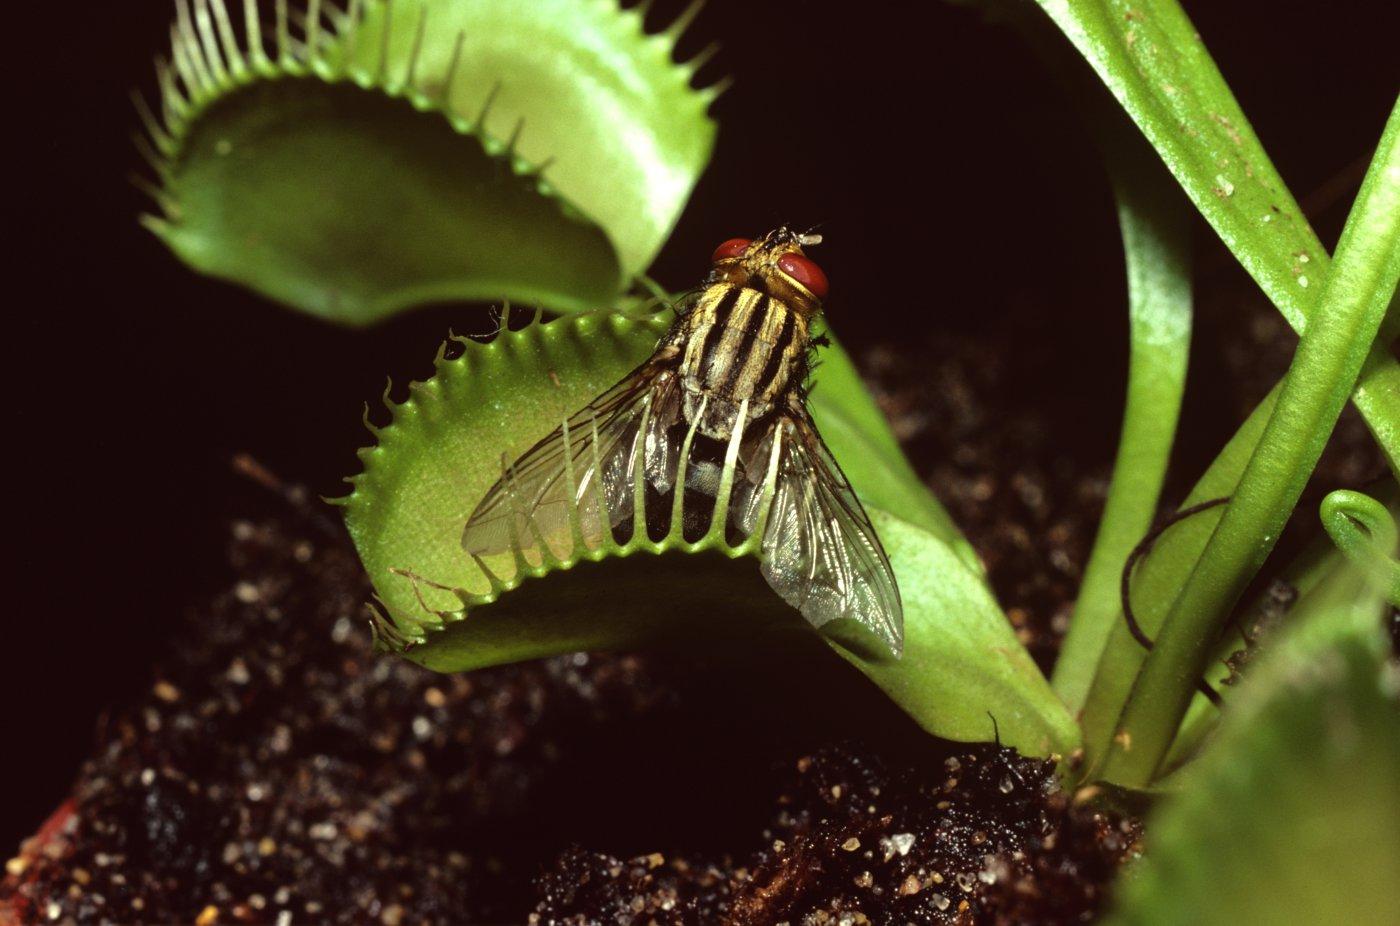 The intelligence of the Venus flytrap